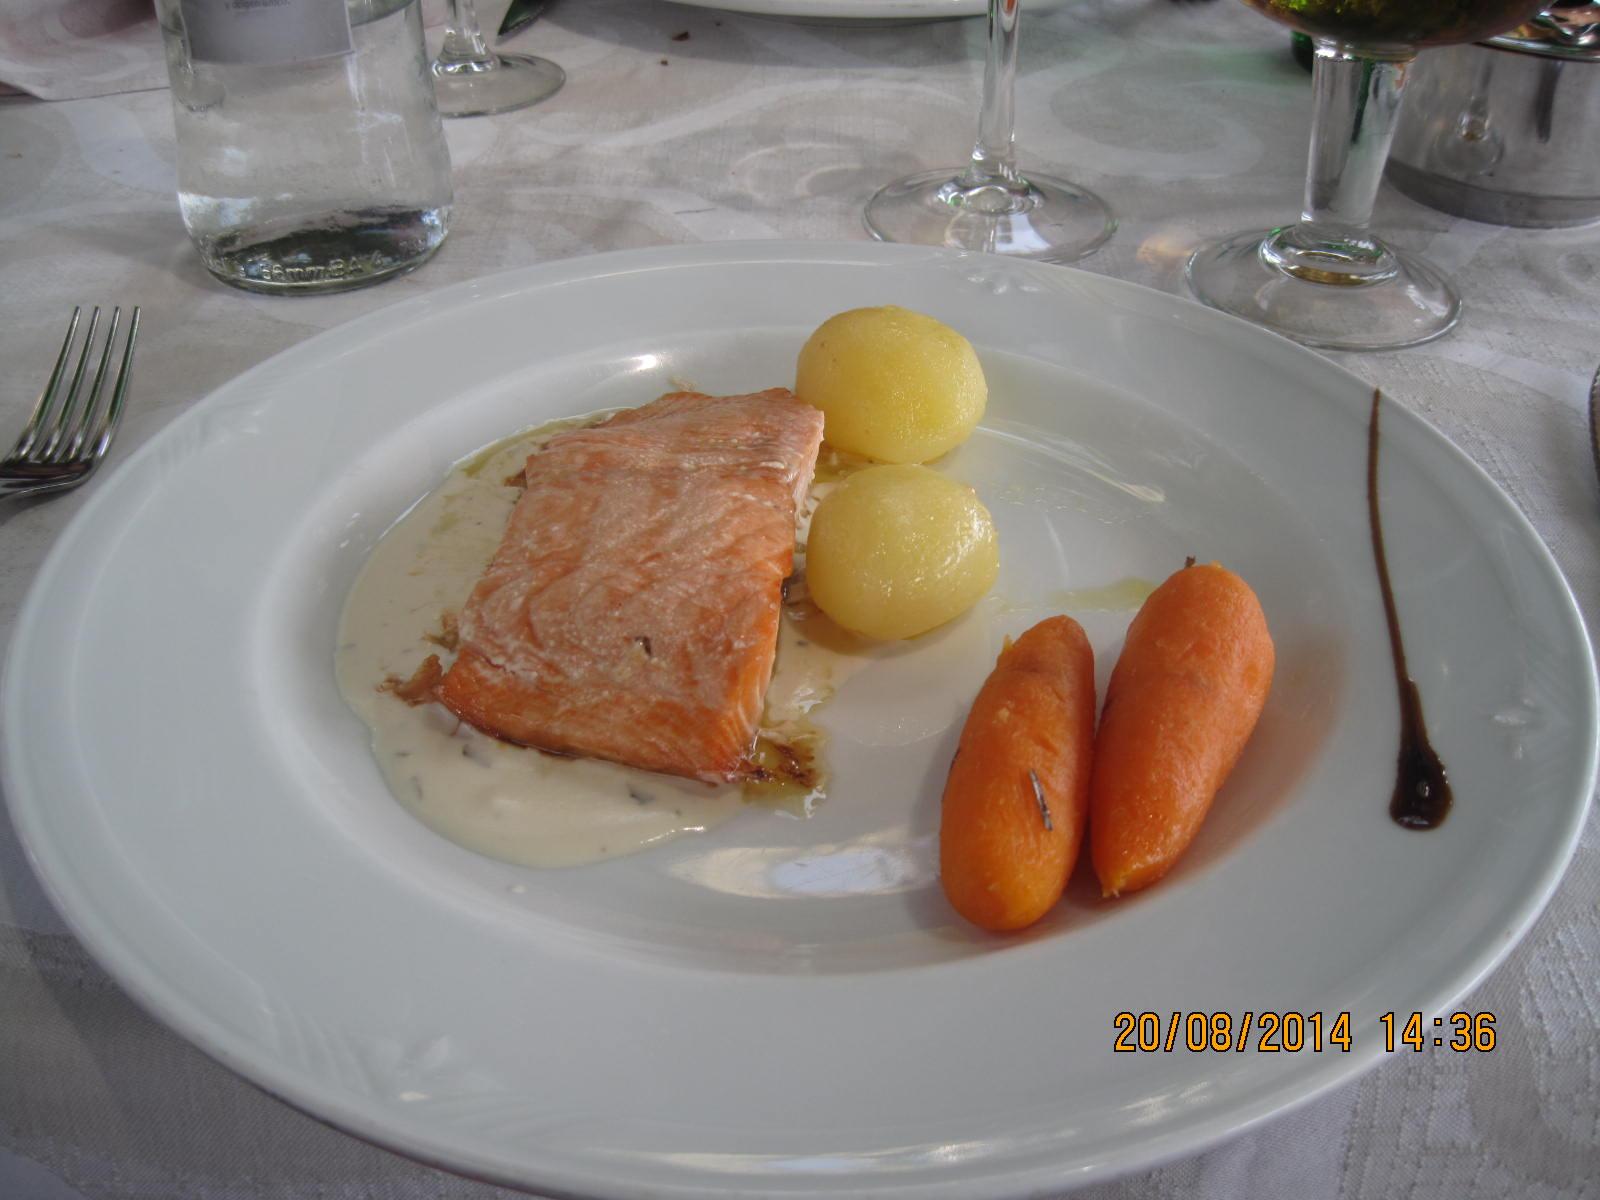 Restaurant Review: Rebate, Alicante Province